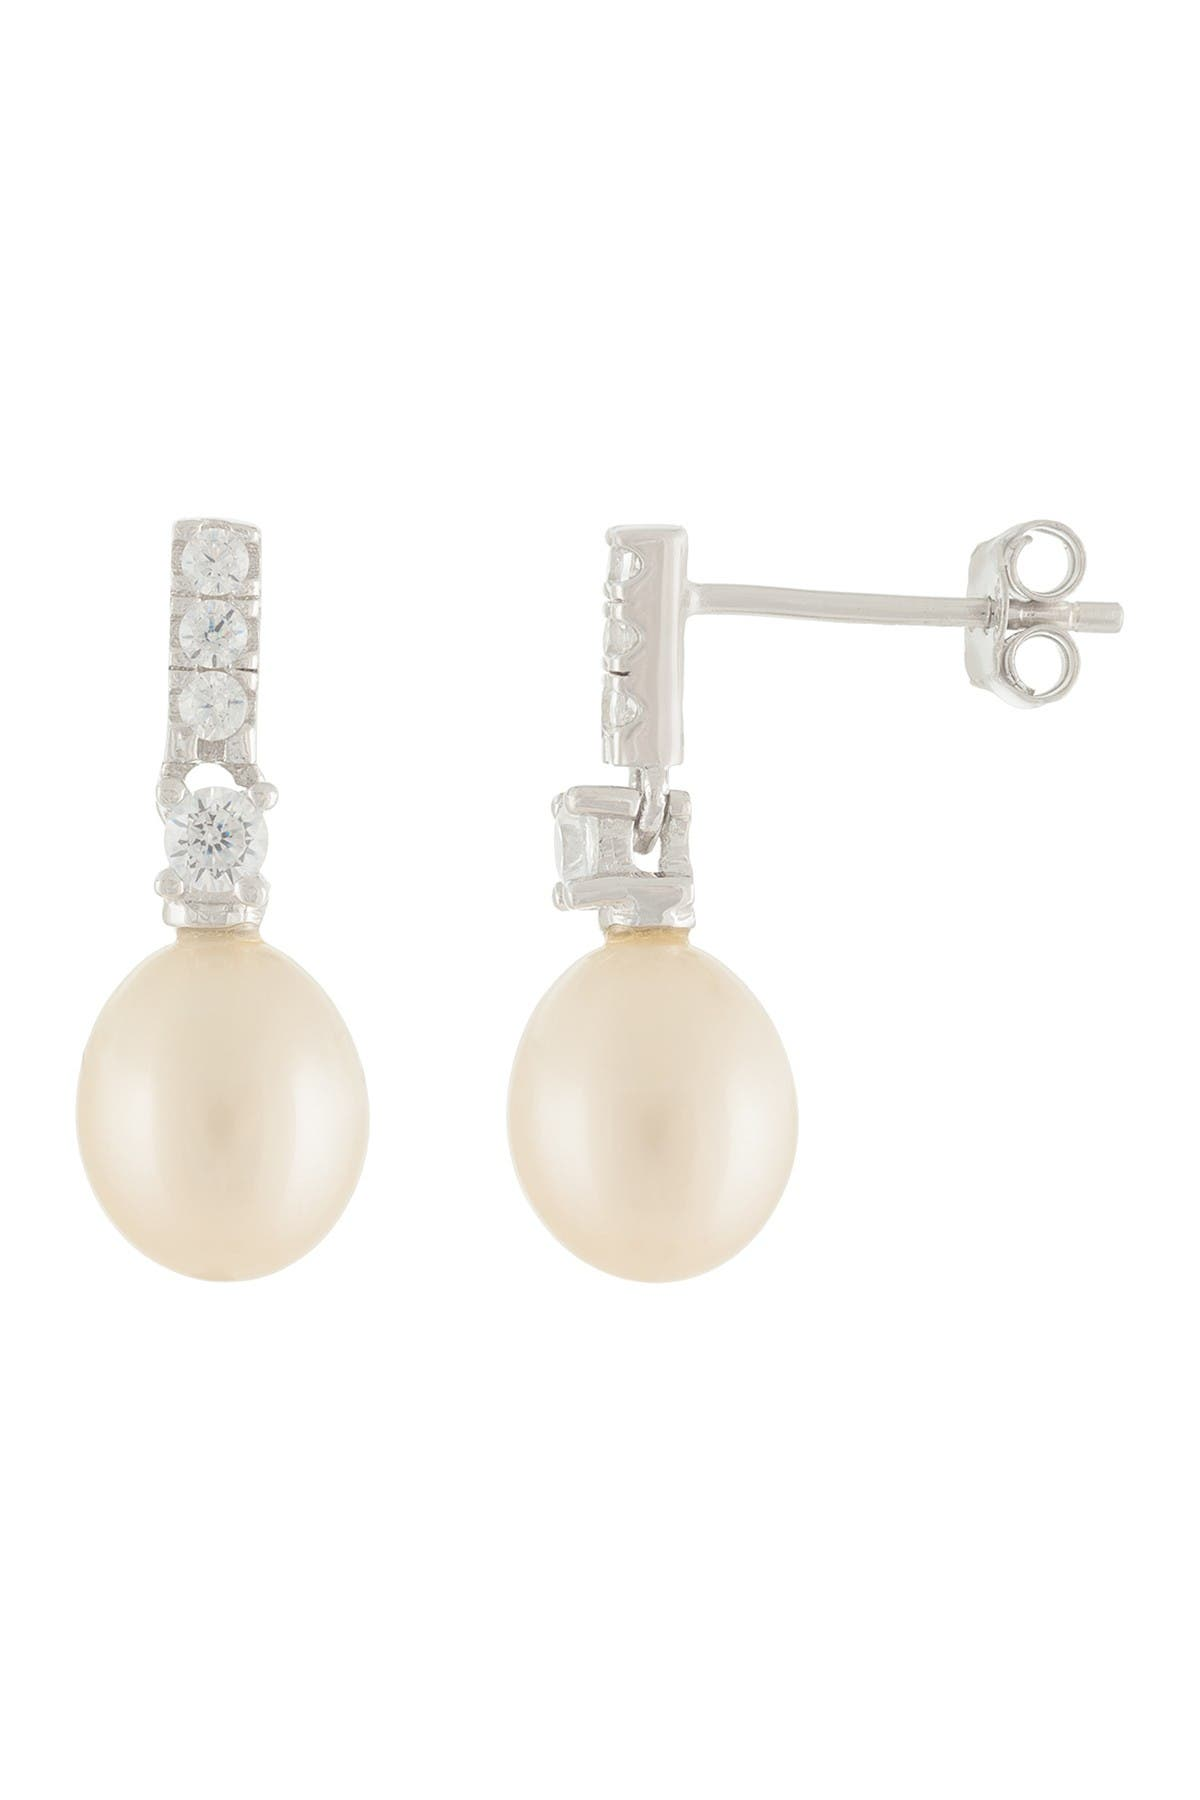 Image of Splendid Pearls CZ & 7-7.5mm Cultured Freshwater Pearl Earrings